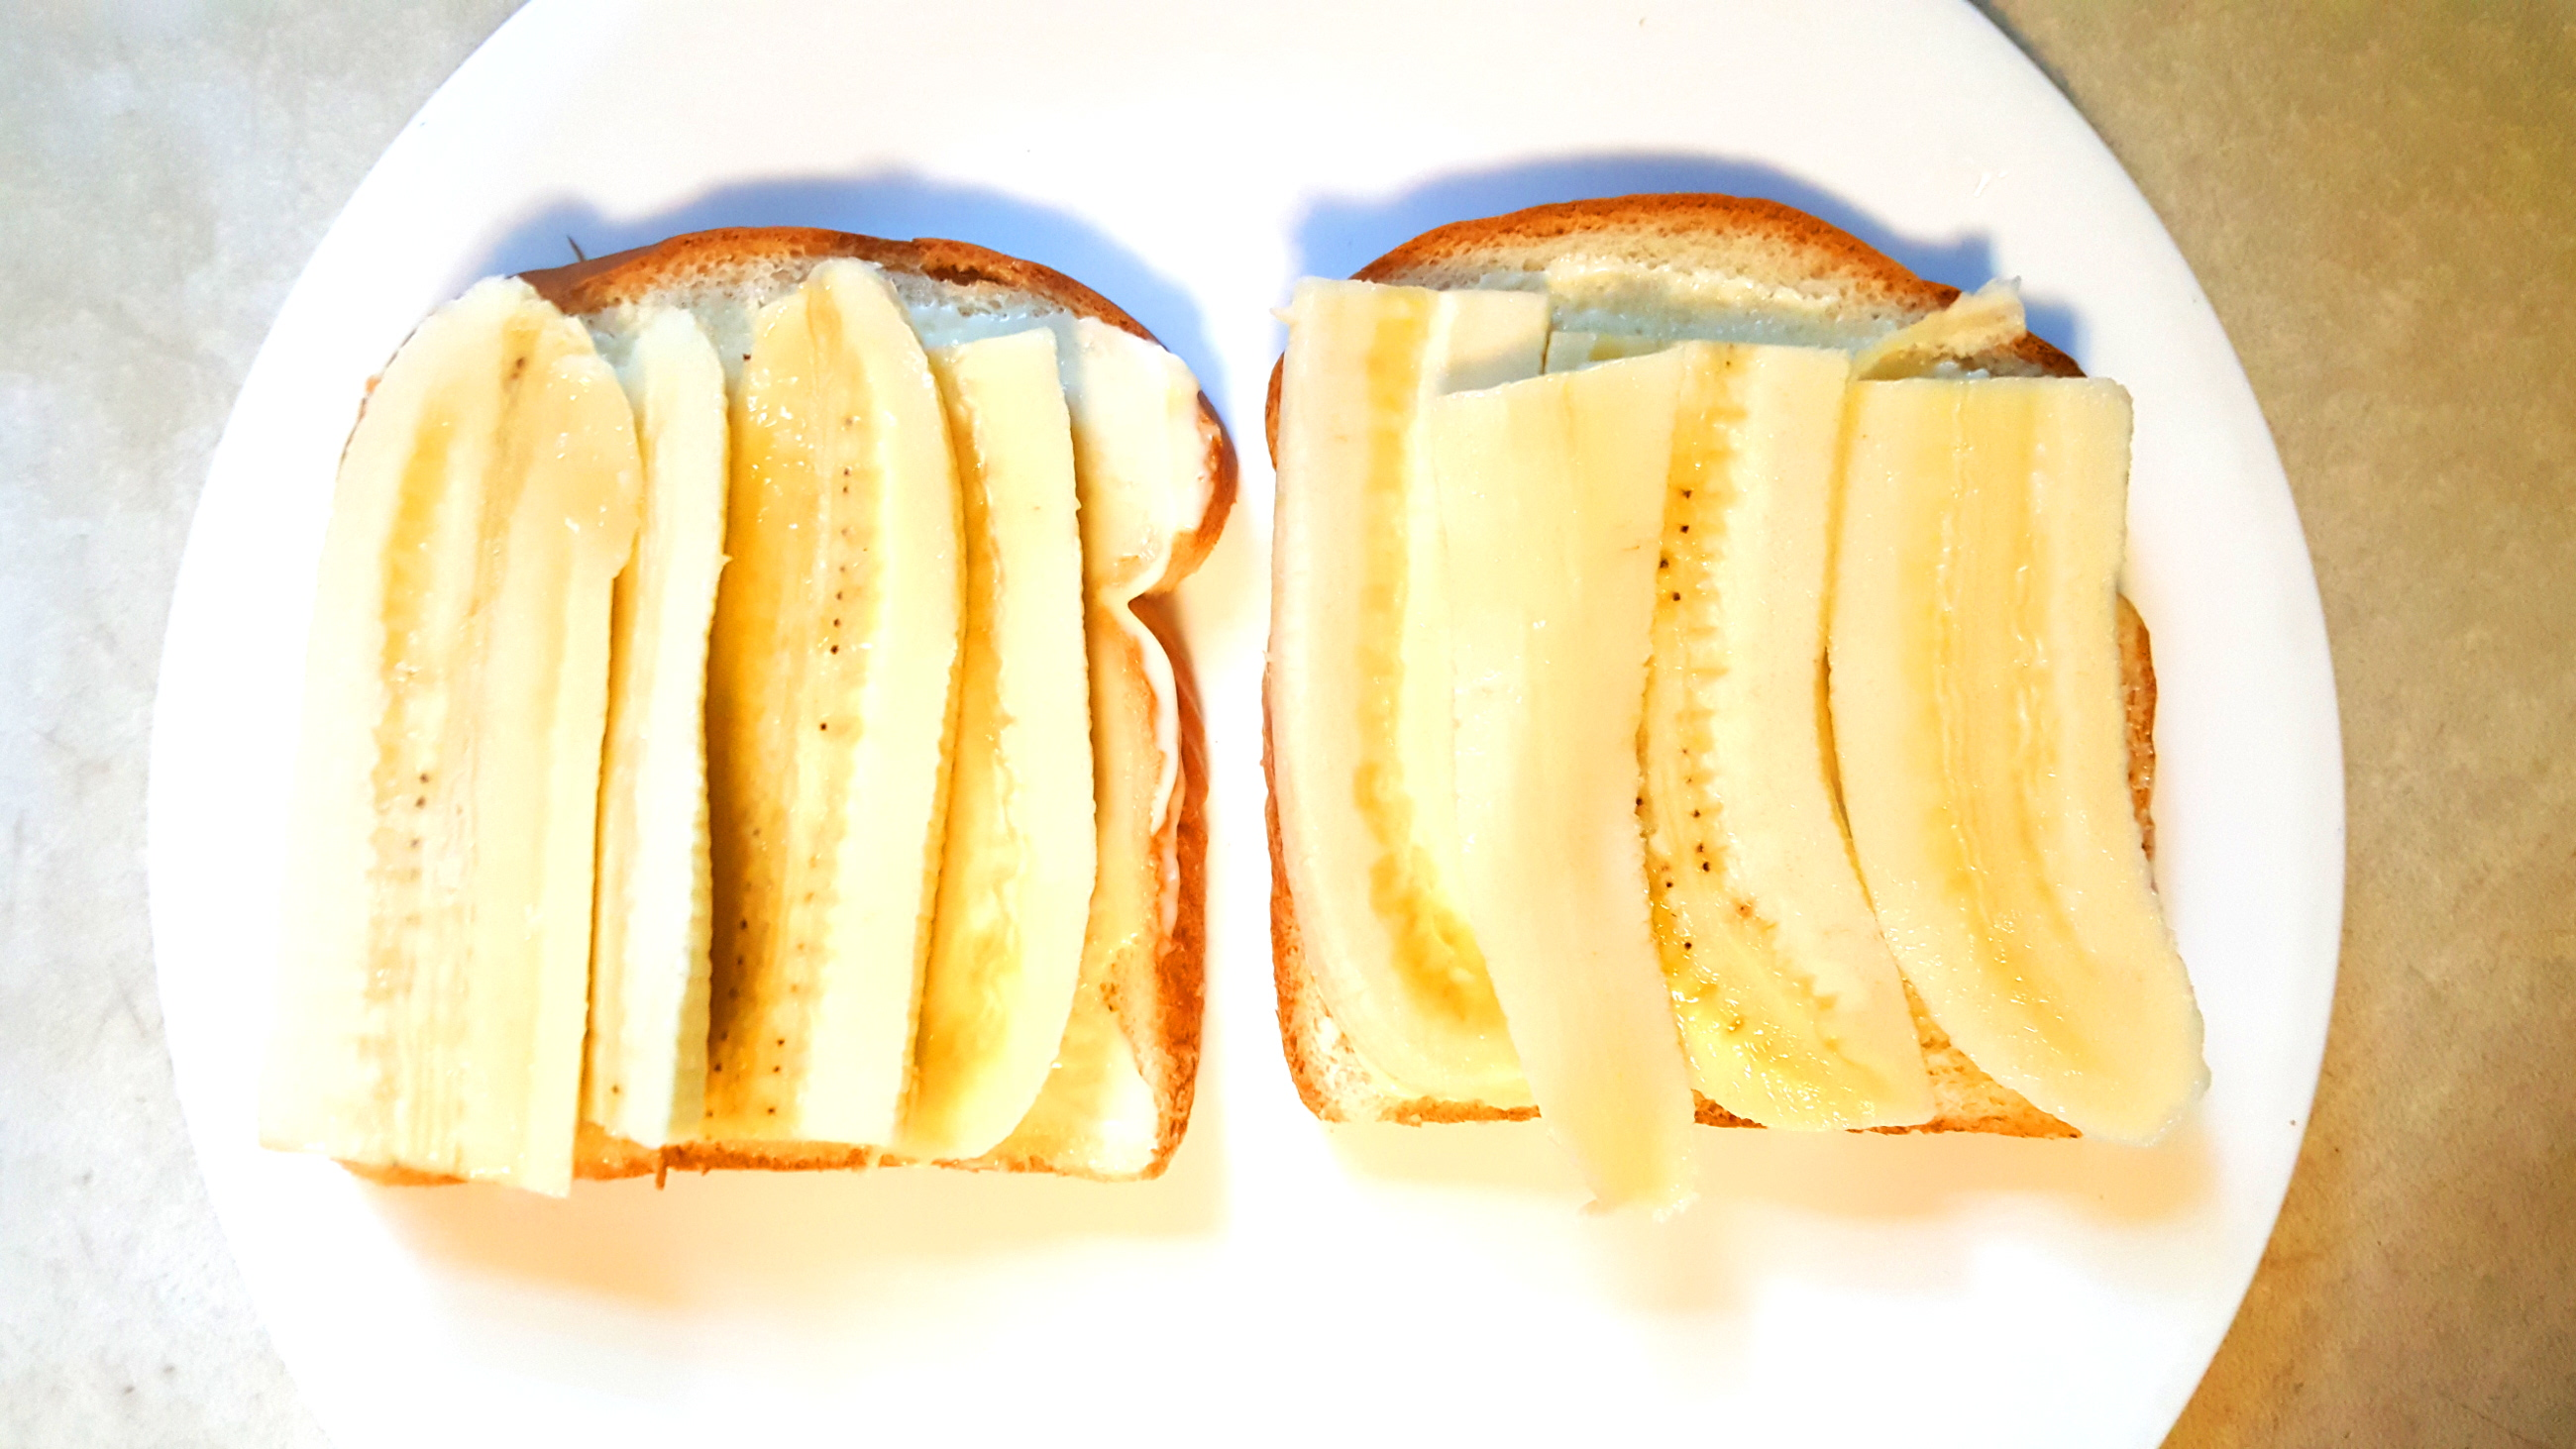 Fruit Sandwich #1: The Whitest Sandwich Ever